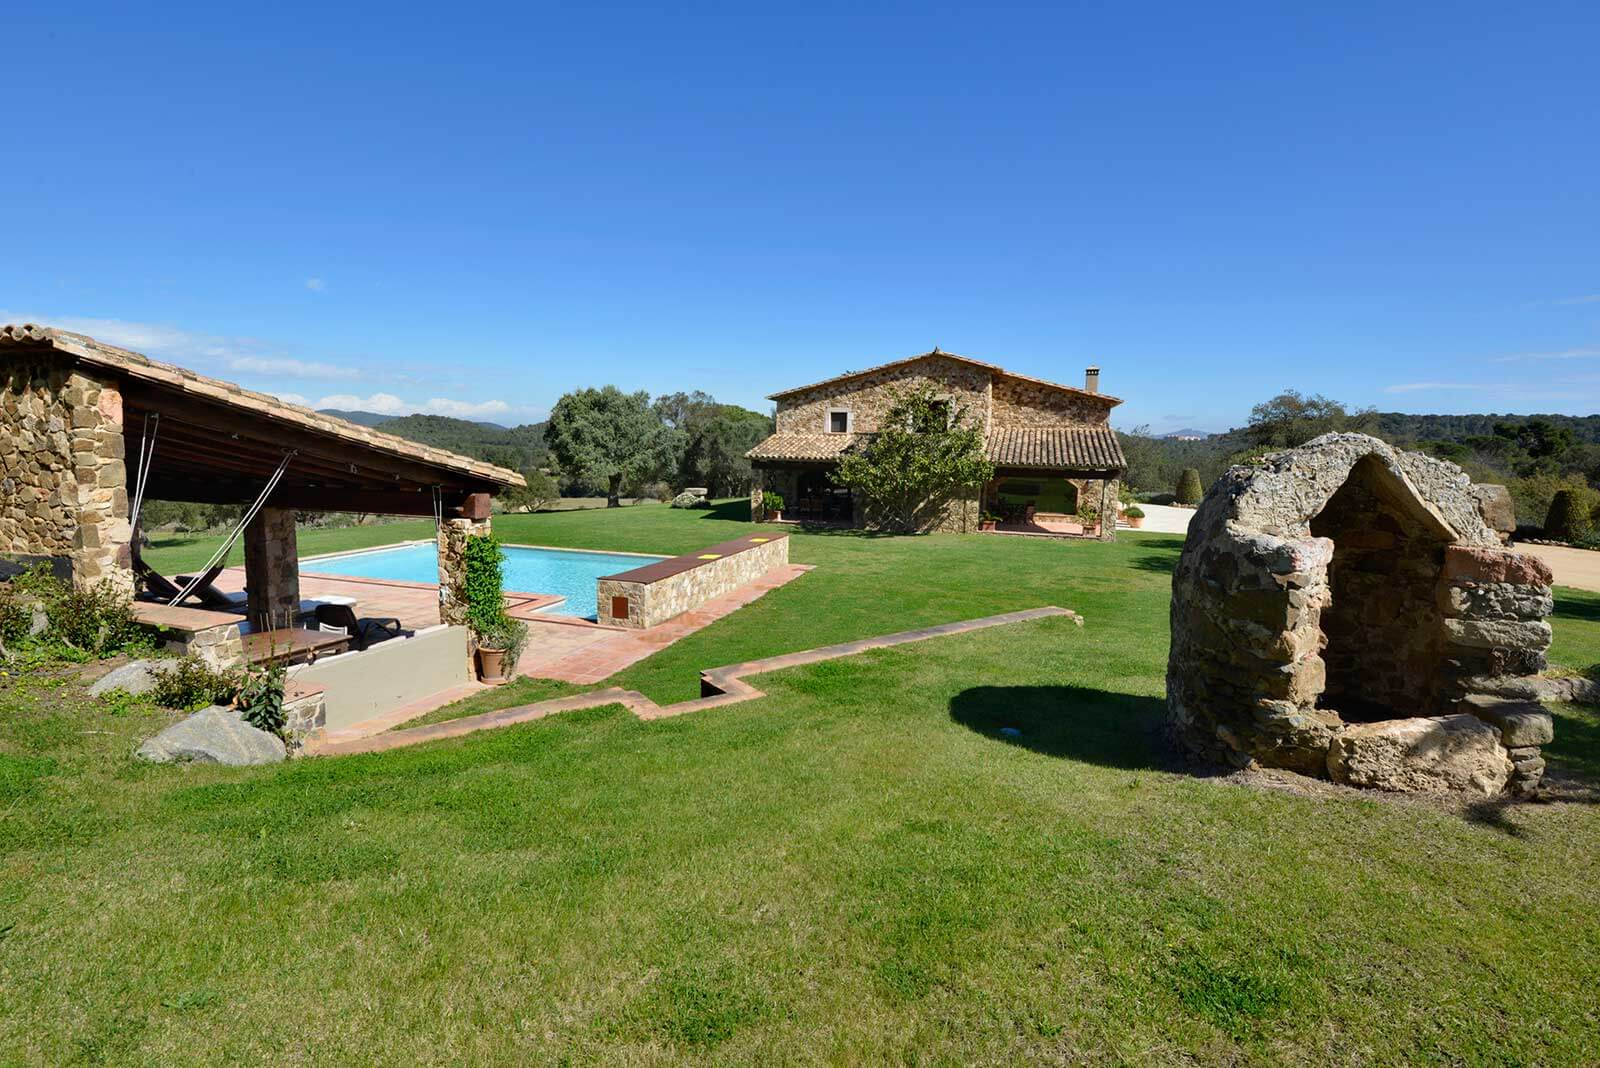 Mas Gall garden and pool